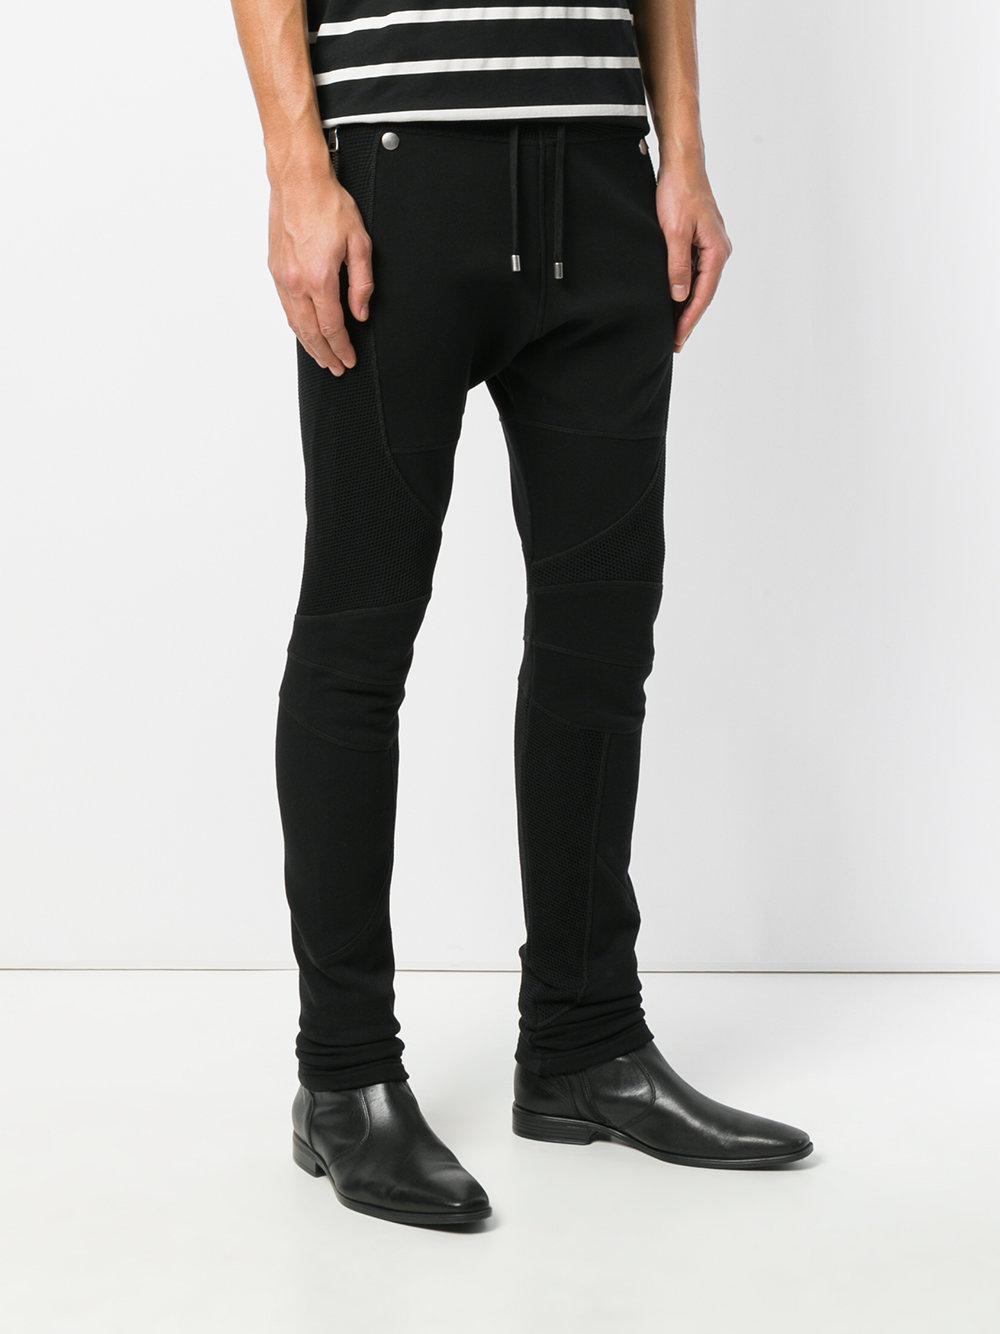 Balmain Cotton Mesh-panelled Sweatpants in Black for Men